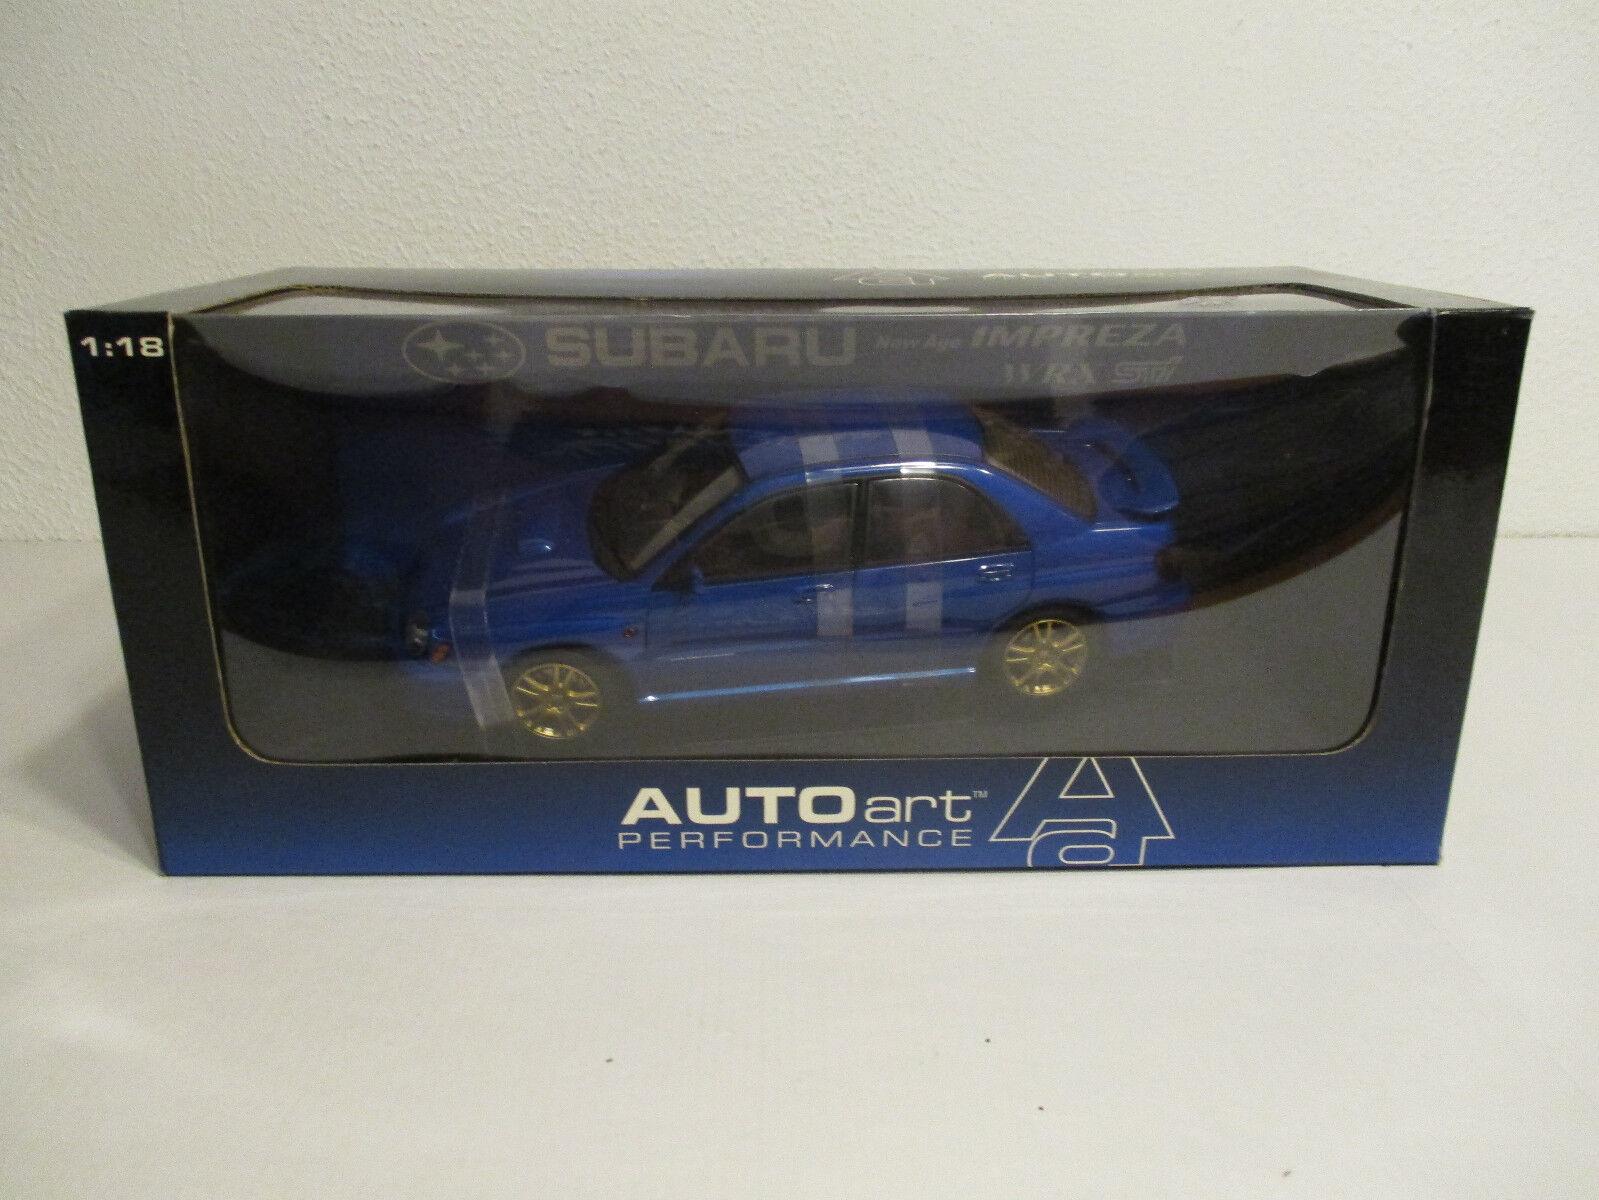 (Modelage) 1 18 Autoart Subaru New Age Impreza WRX STI bleu Nouveau neuf dans sa boîte